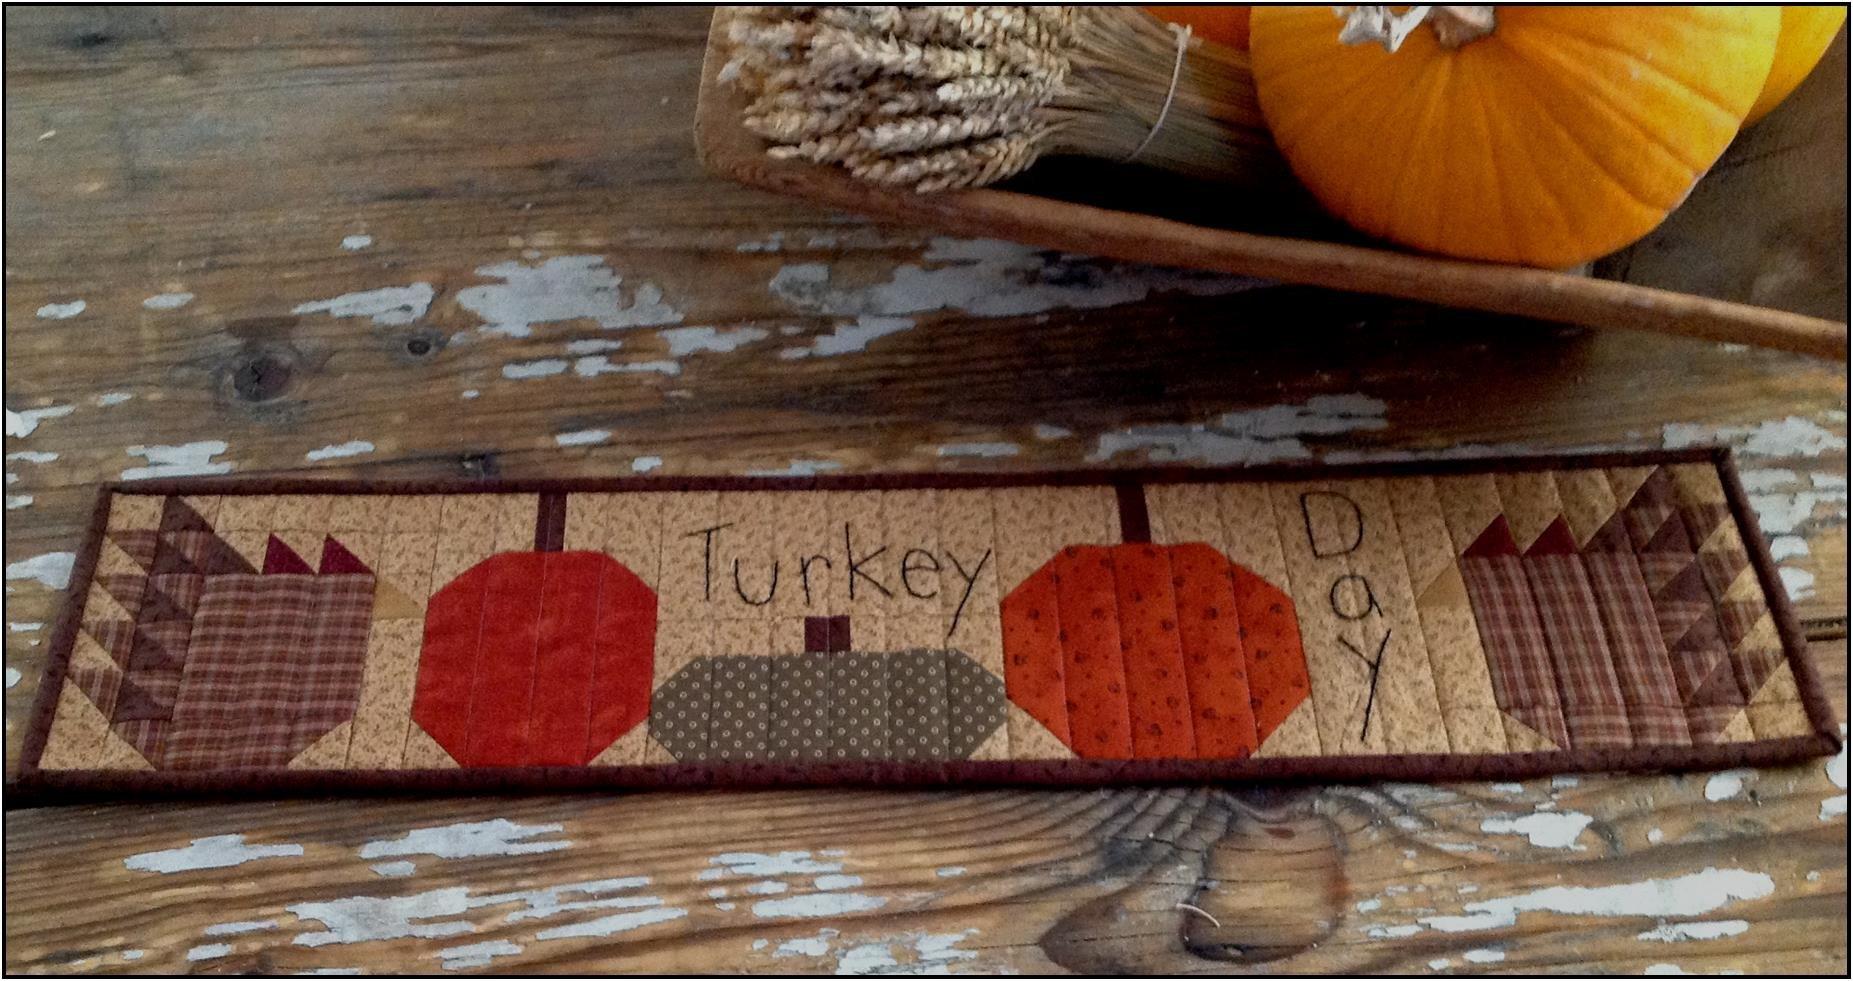 Turkey Day Mini Runner